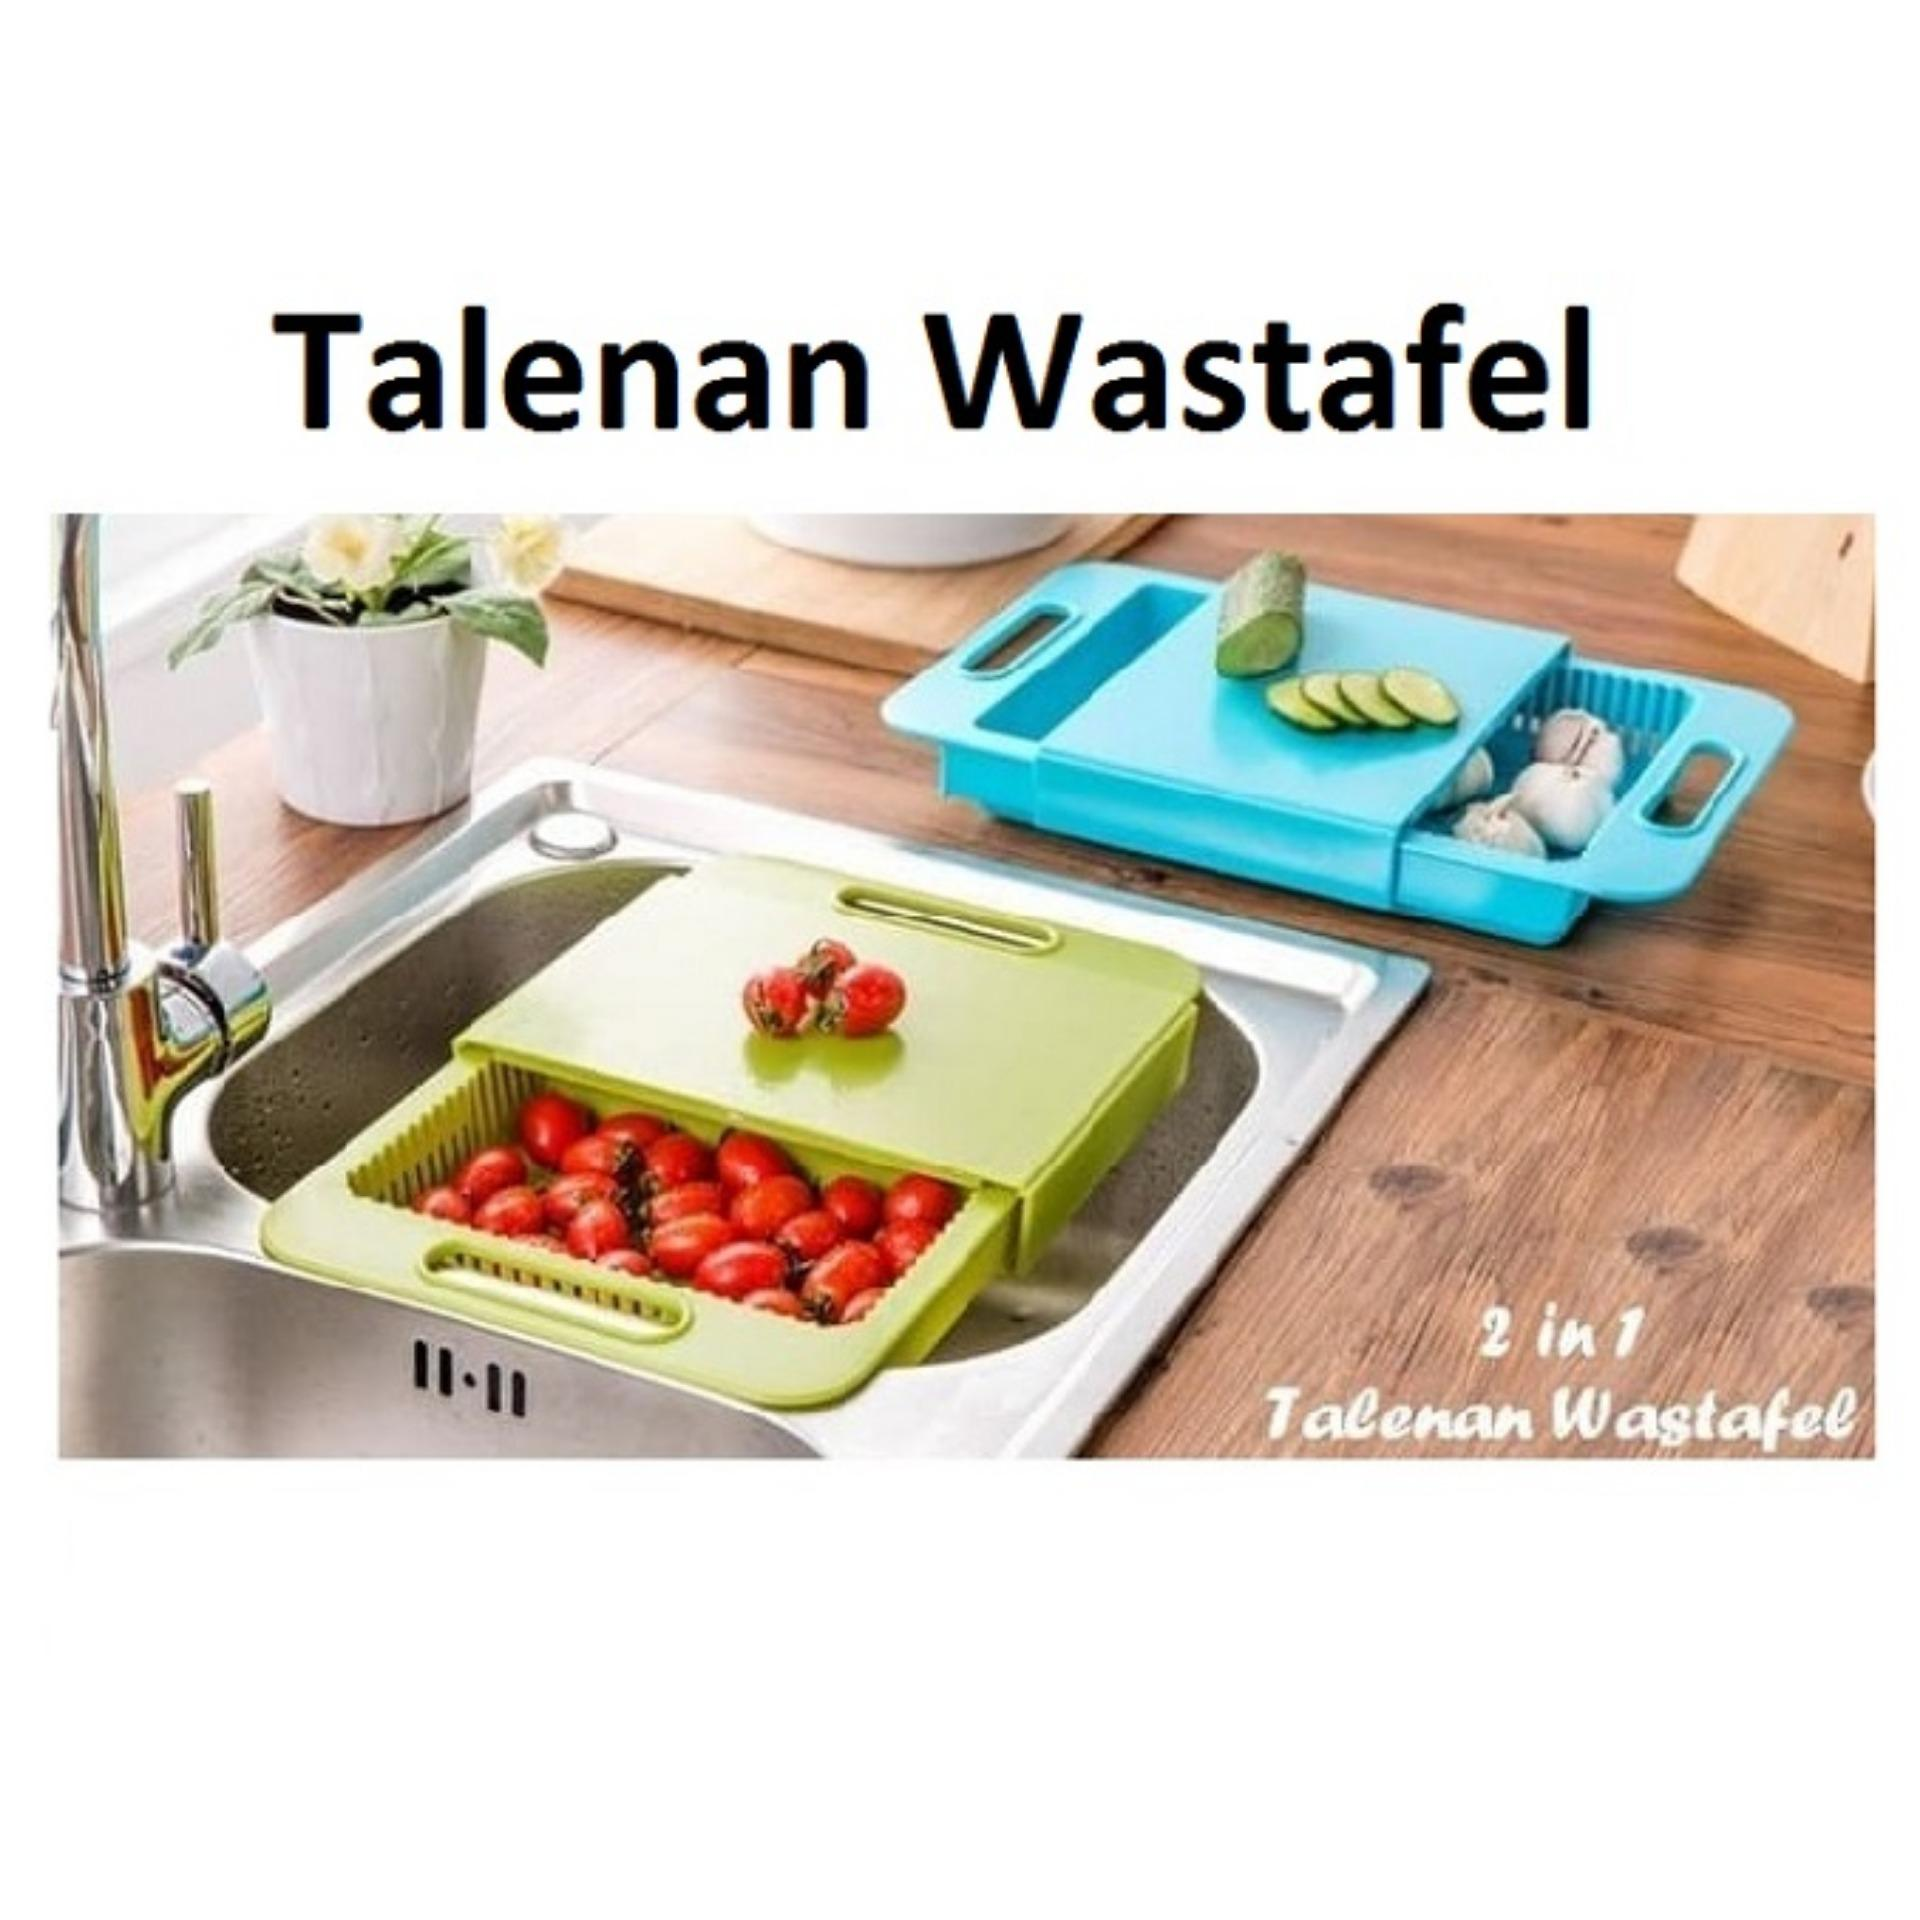 AE4011 Outdoor Chopping Board Praktis 2in1 Talenan Wastafel